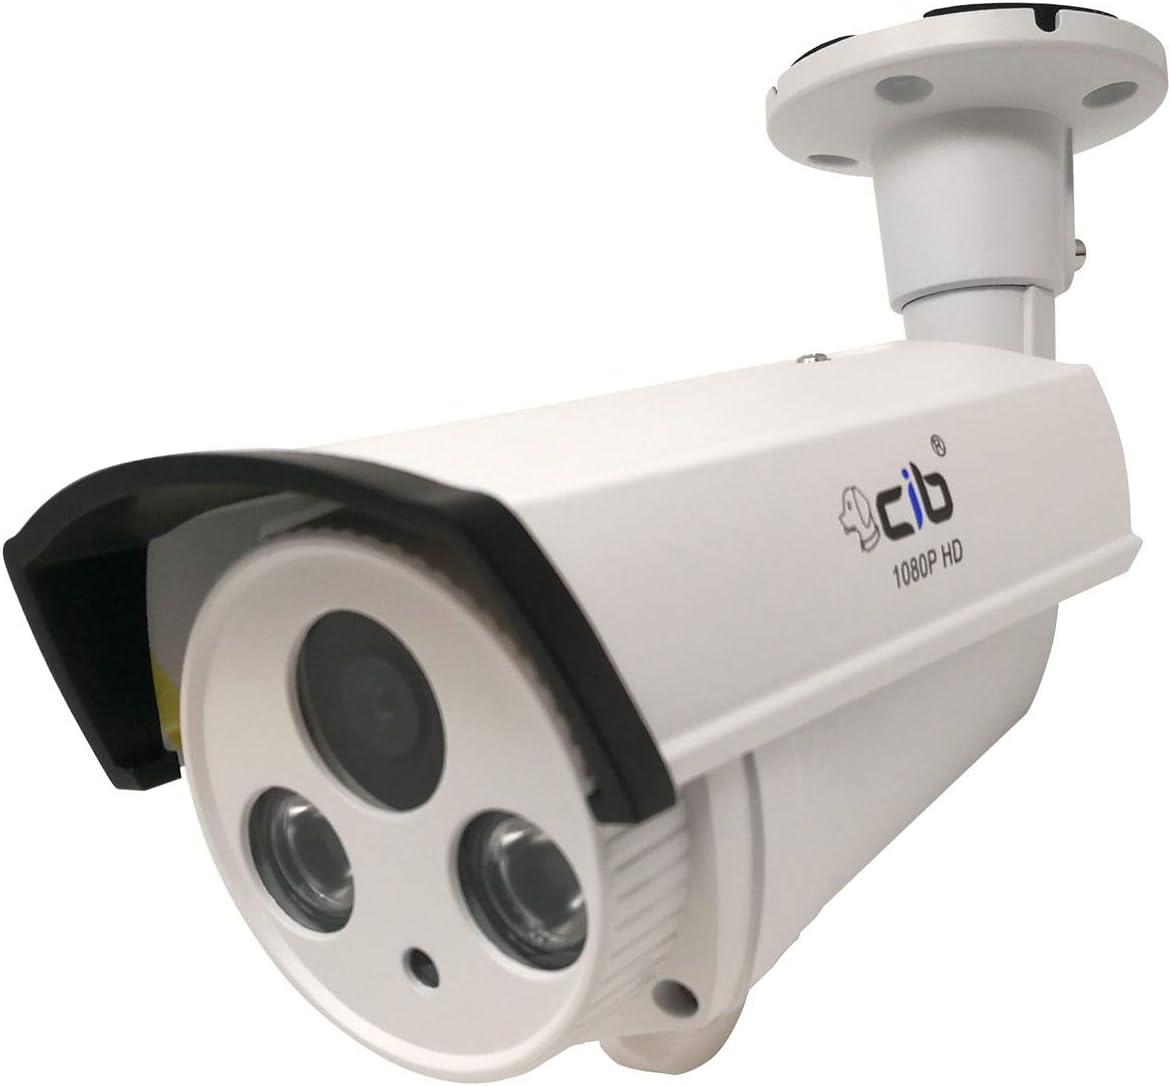 CIB Security Day/Night Vision True HD-TVI 1080P 2.1Megapixel HD Bullet Cameras/Long Range up to 150', White (CUT80P0856-150W)